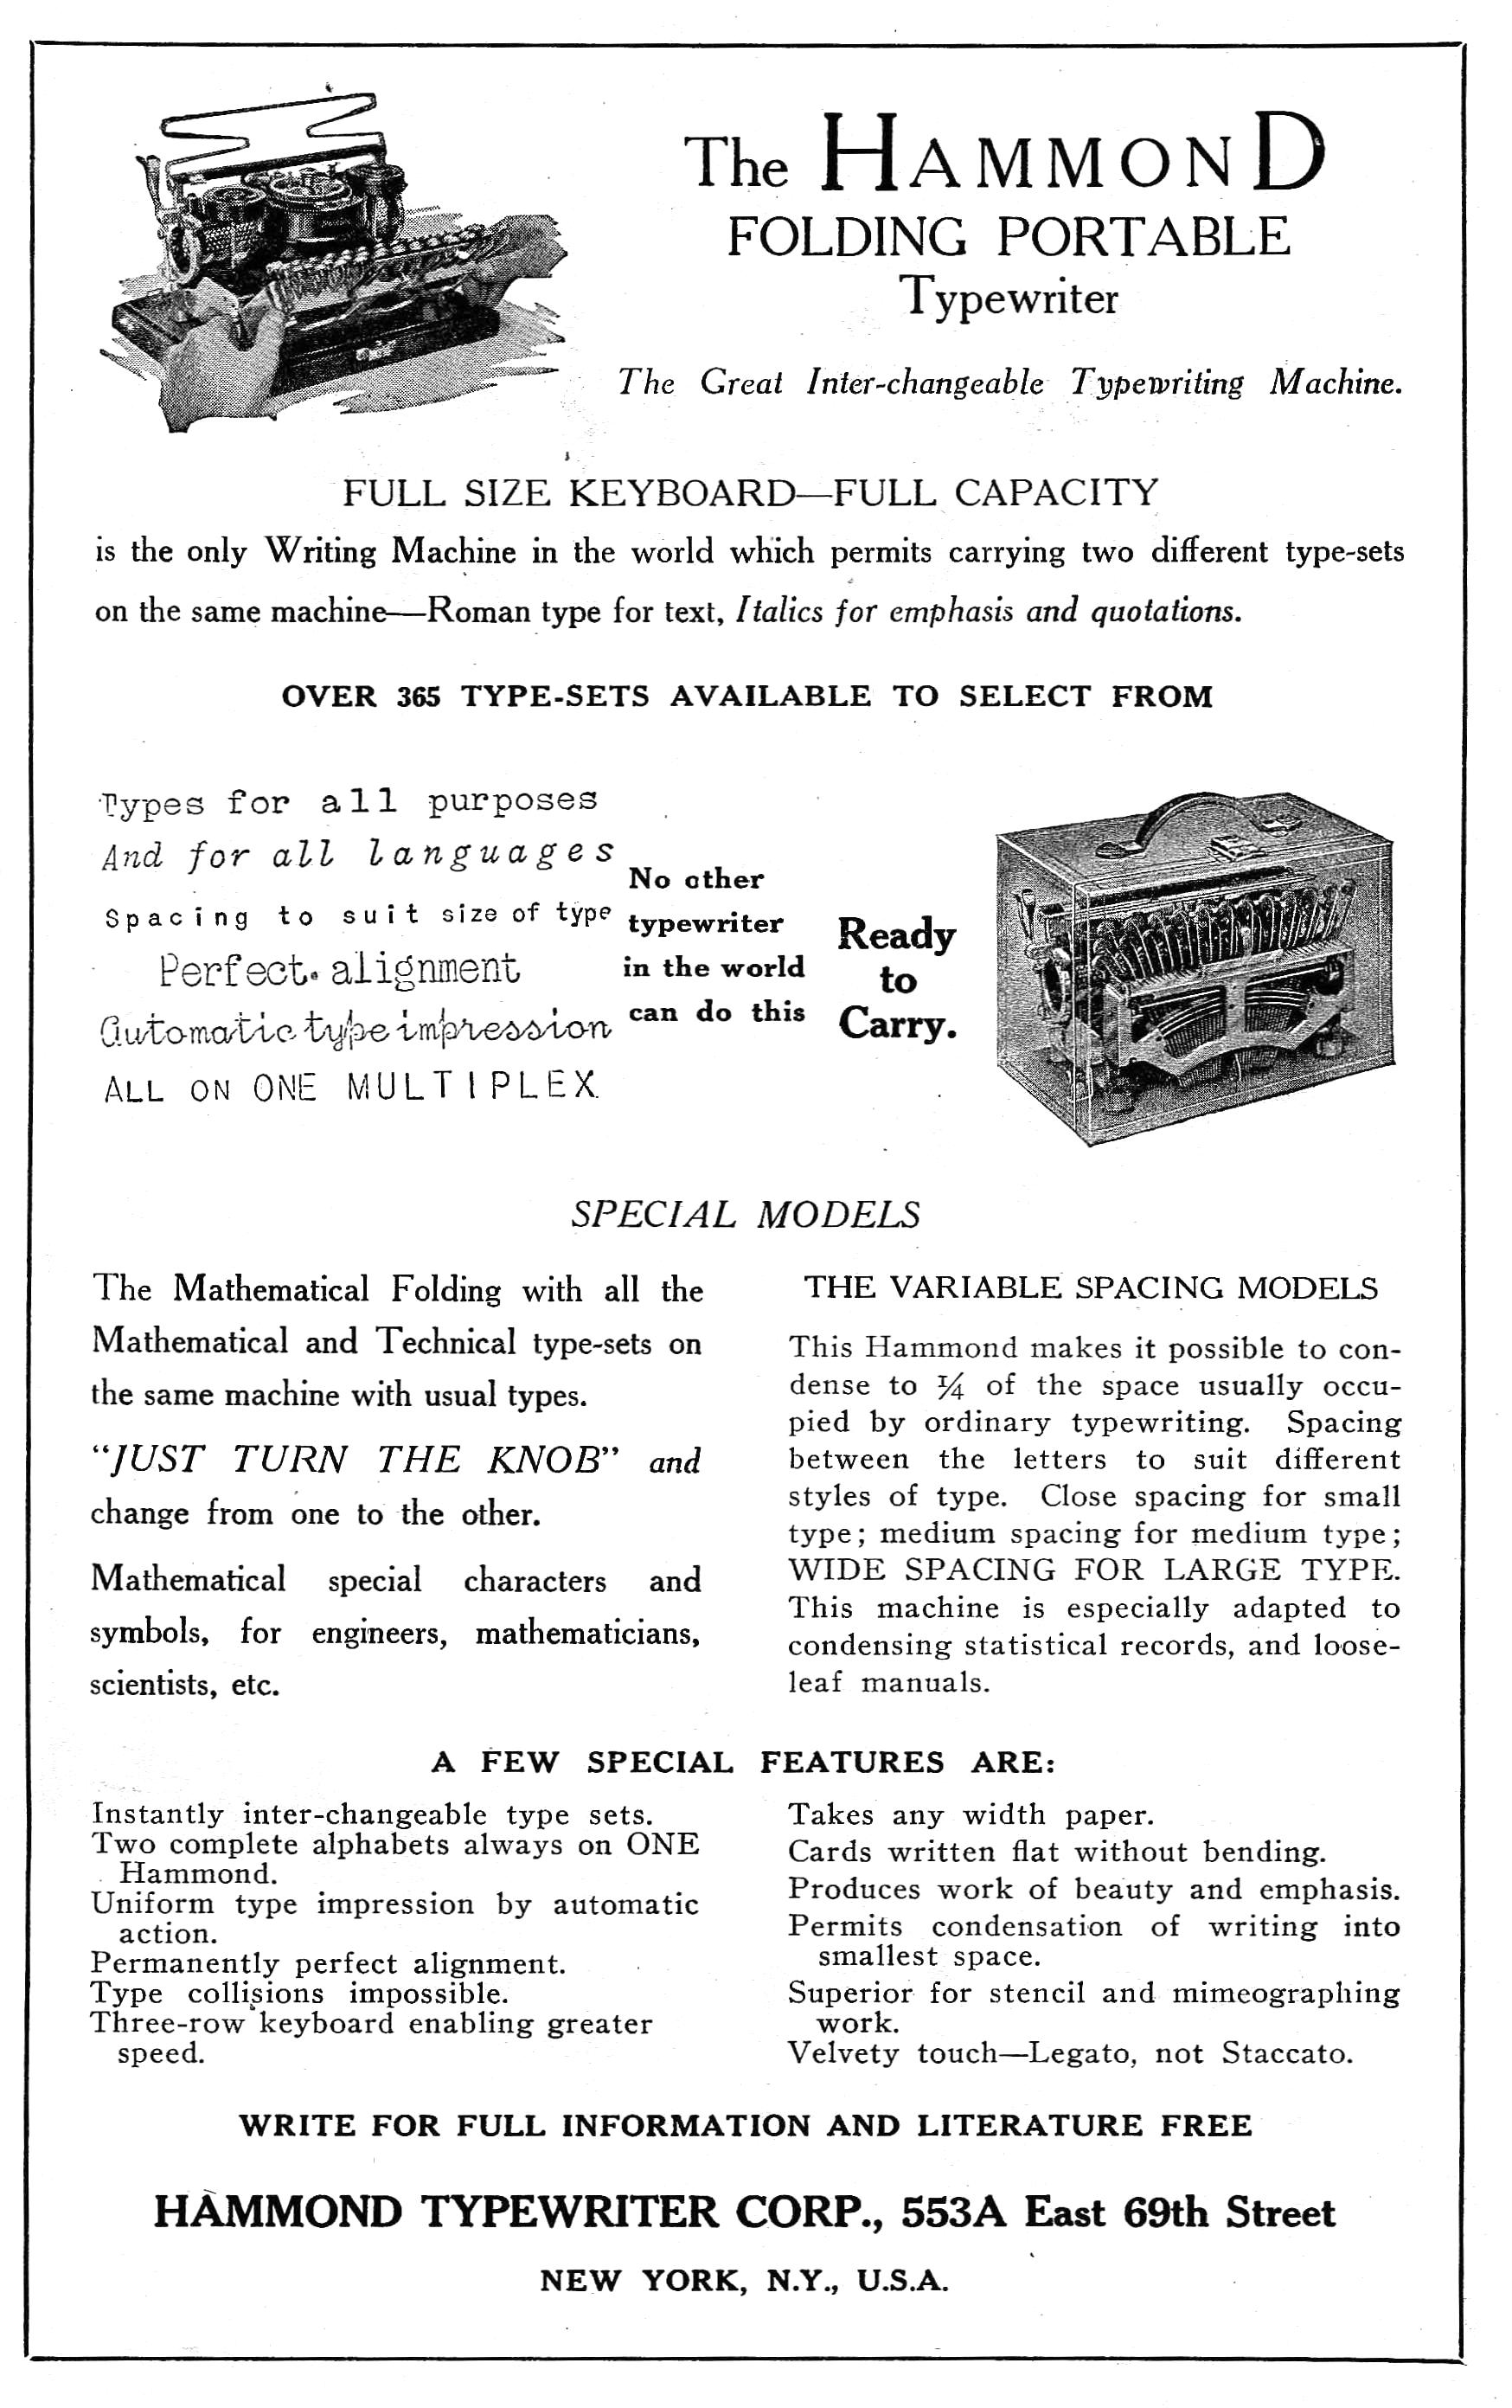 Filehammond folding portable typewriterg wikimedia commons thumbnail for version as of 0347 10 april 2015 buycottarizona Images